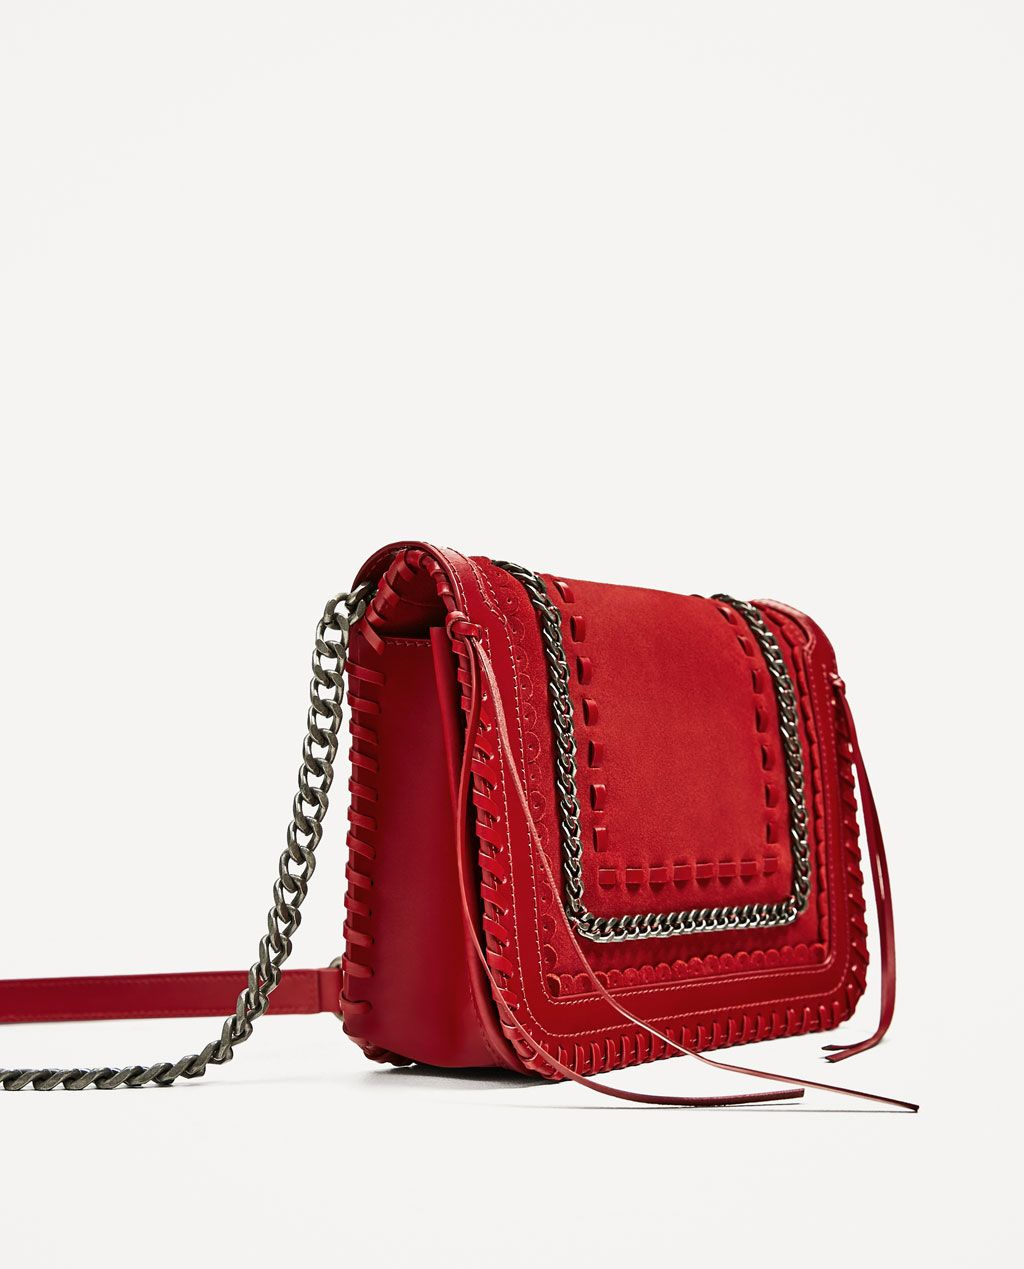 Zara Woman Red Leather Crossbody Bag